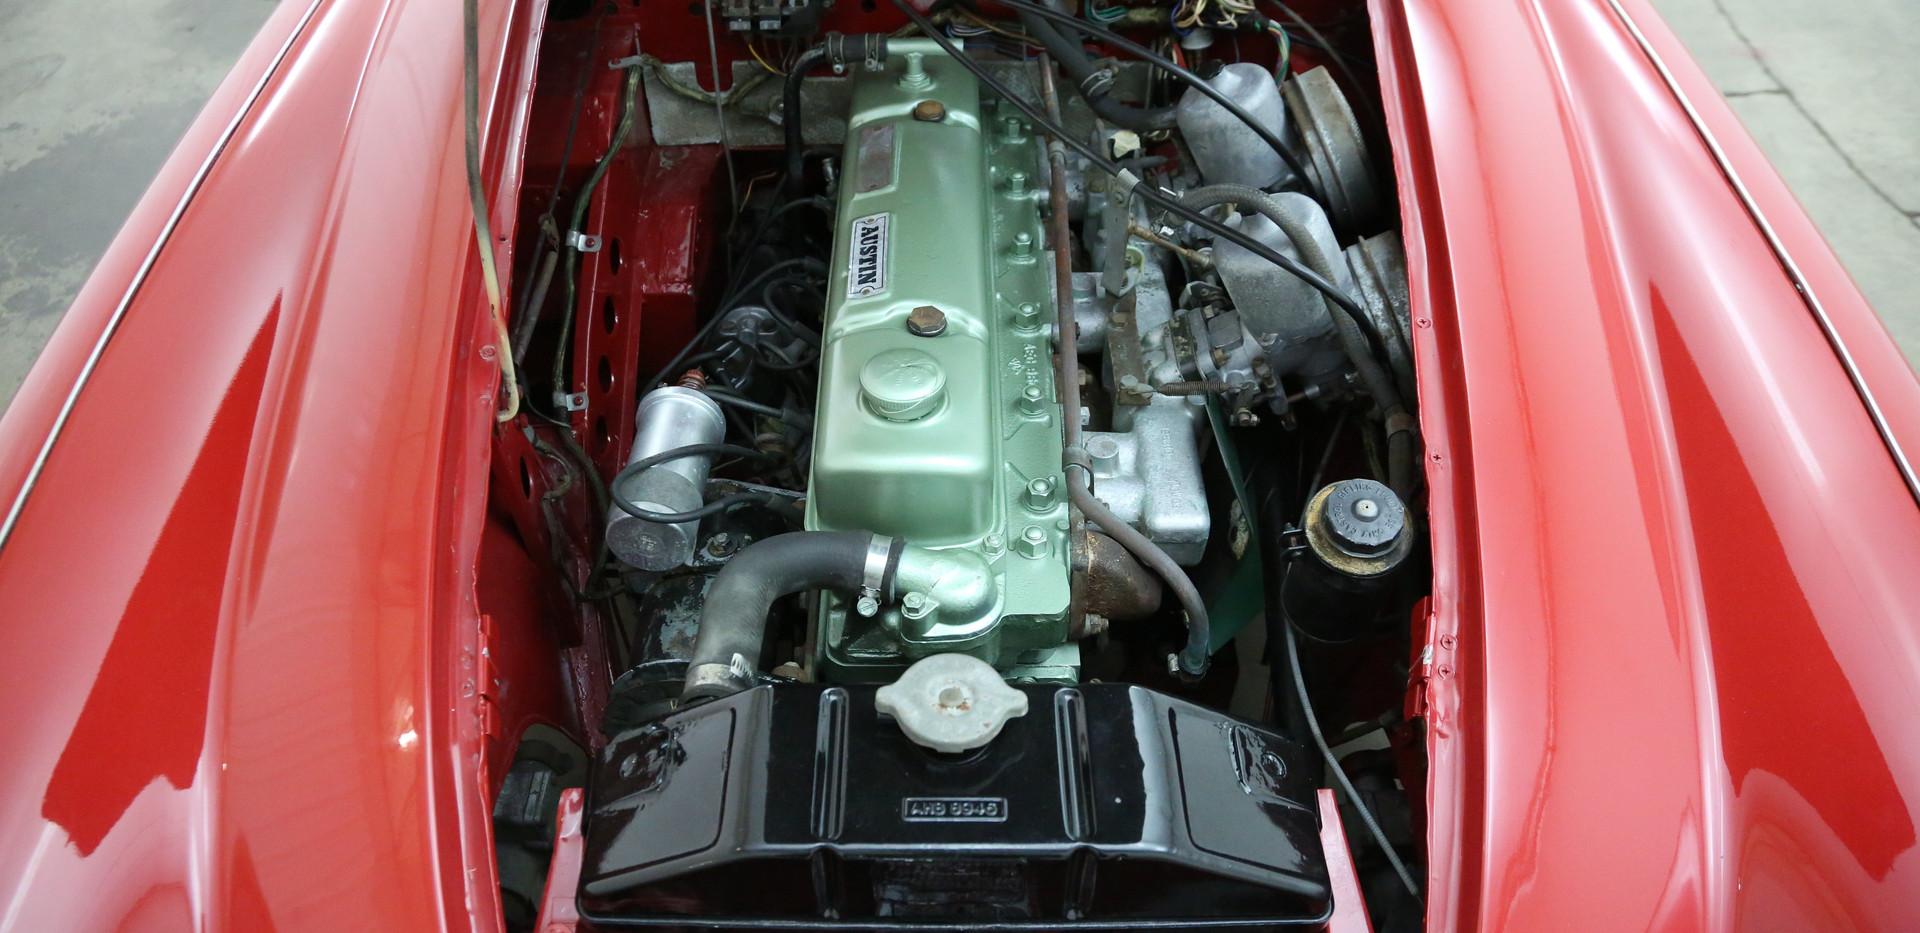 Austin Healey 3000 BJ8 Mk3